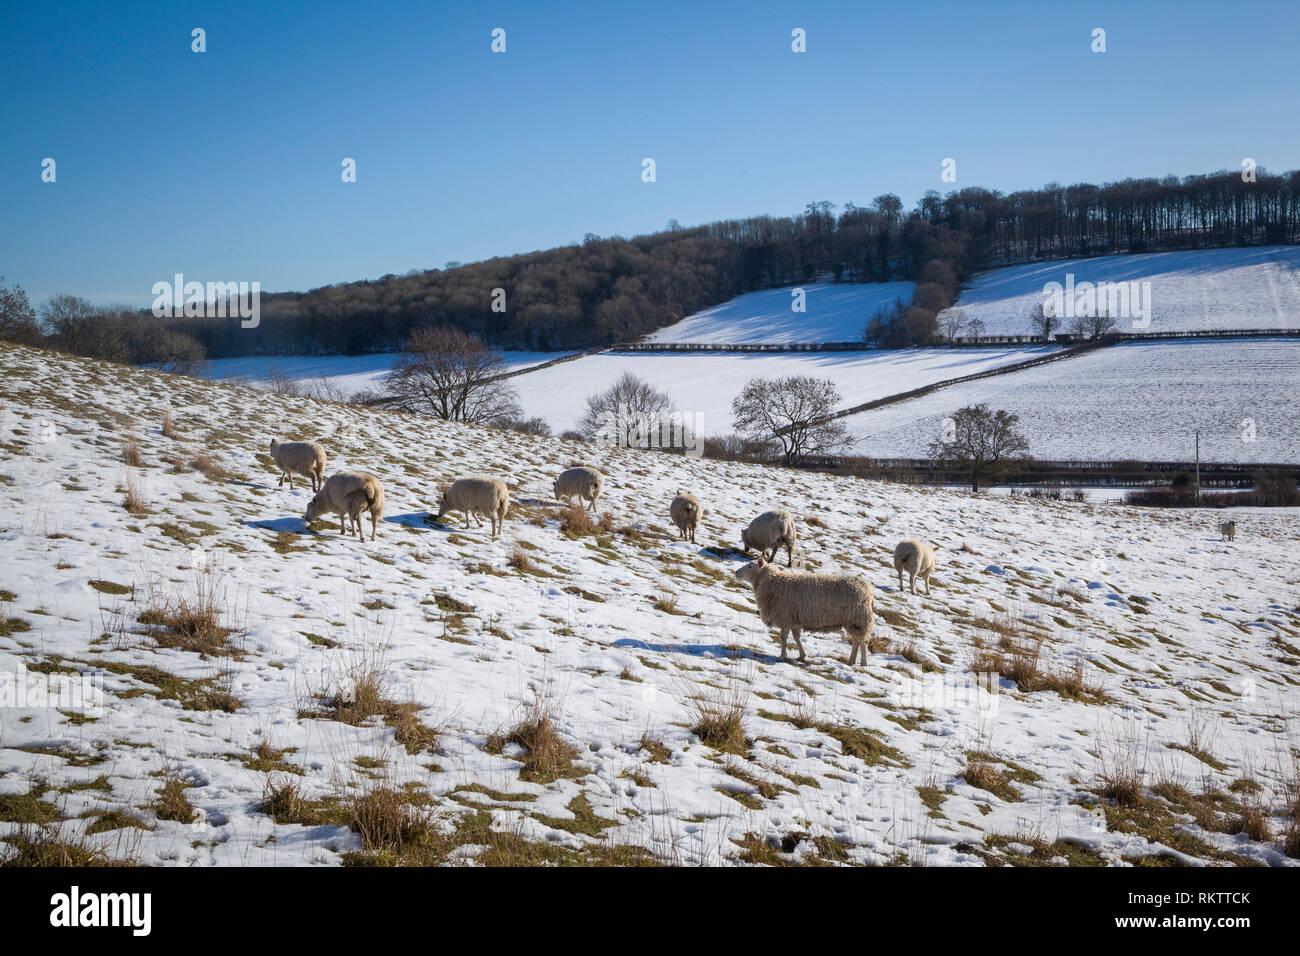 Shhep graze in snow covered fields near the Chiltern village of Fingest, Buckinghamshire. Stock Photo